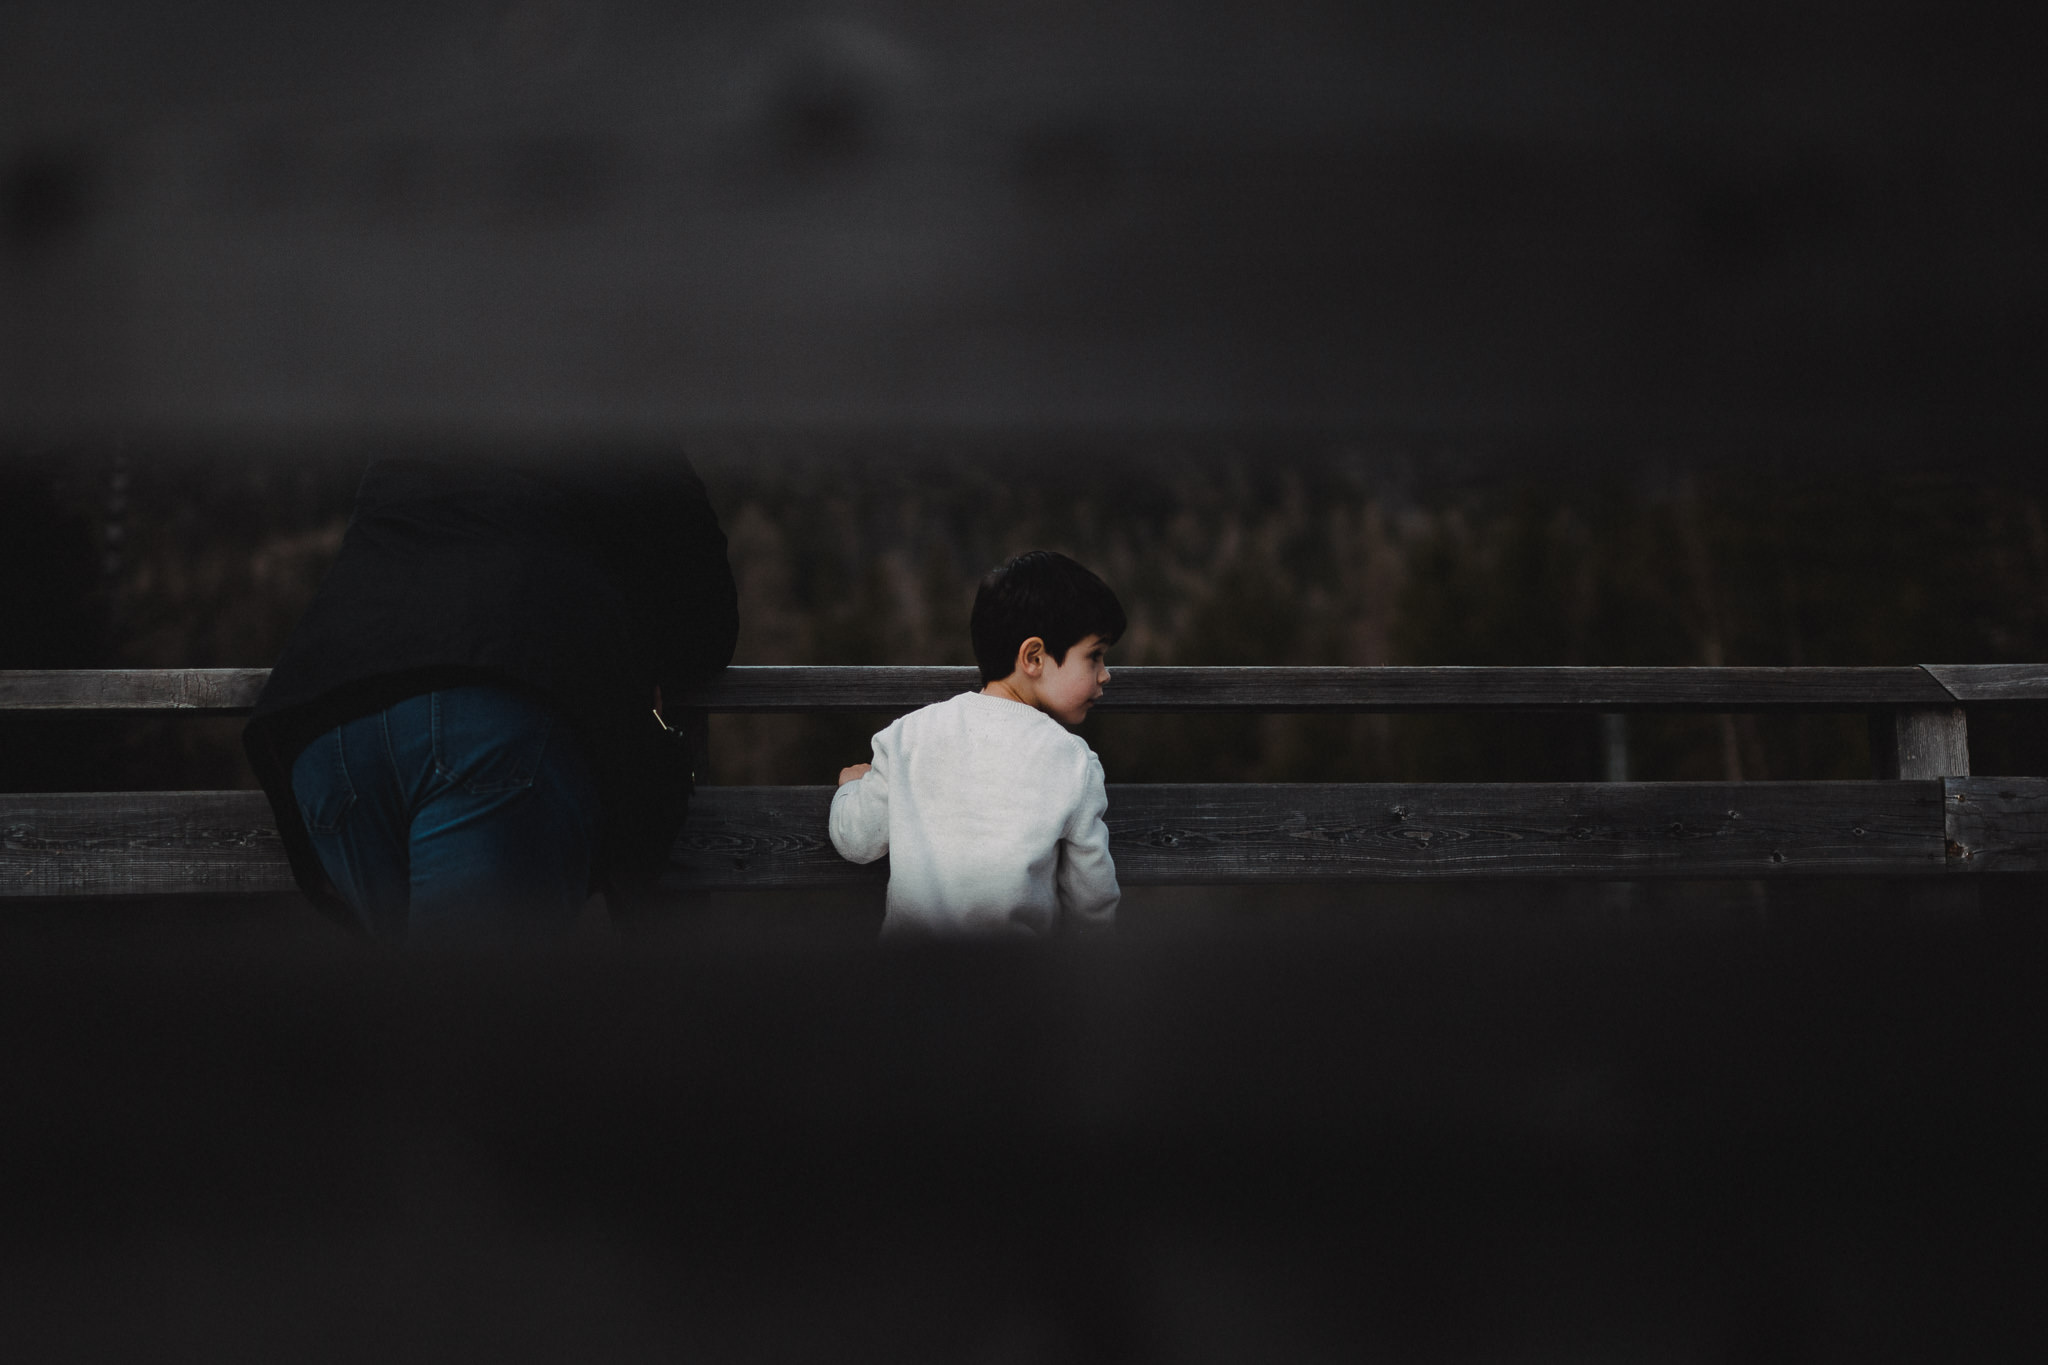 chamonix-portraits-blog-aaronsami-22.jpg